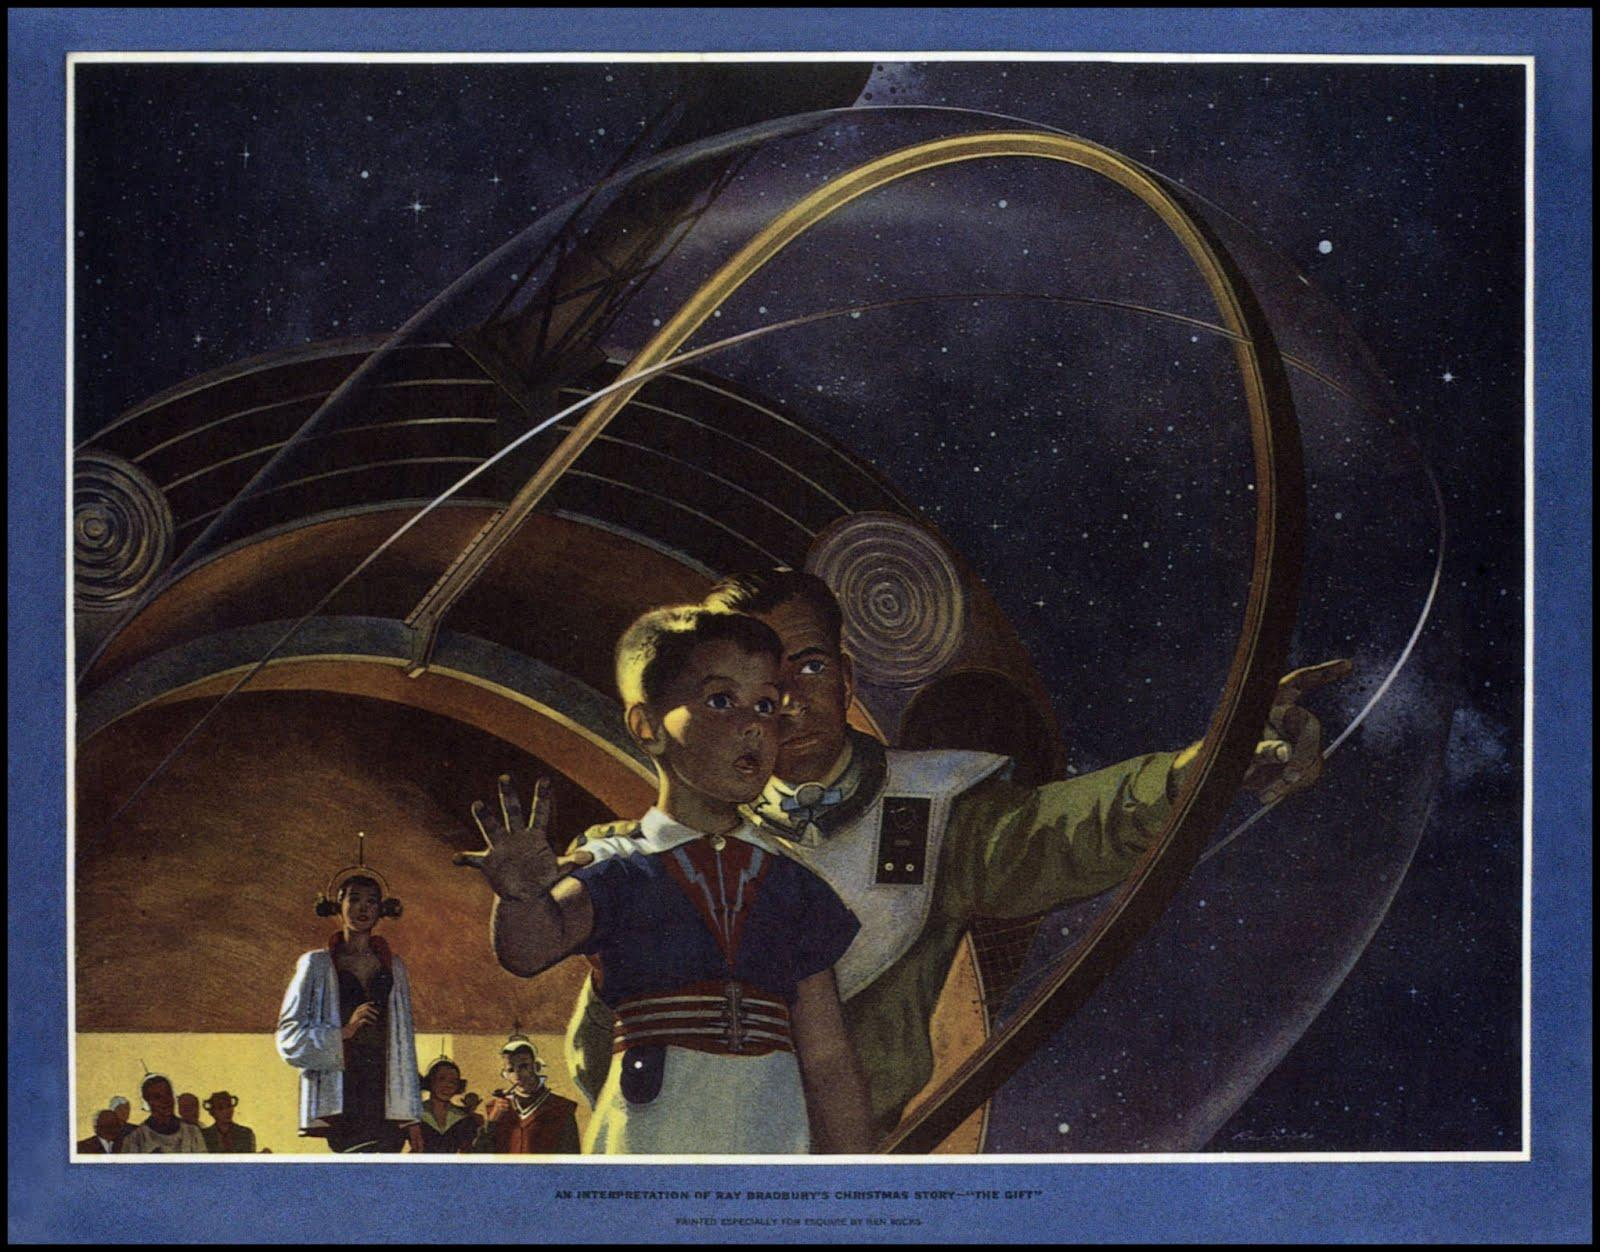 RenWicks_Esquire_Bradbury_Dec1952_100.jpg (1600×1252)